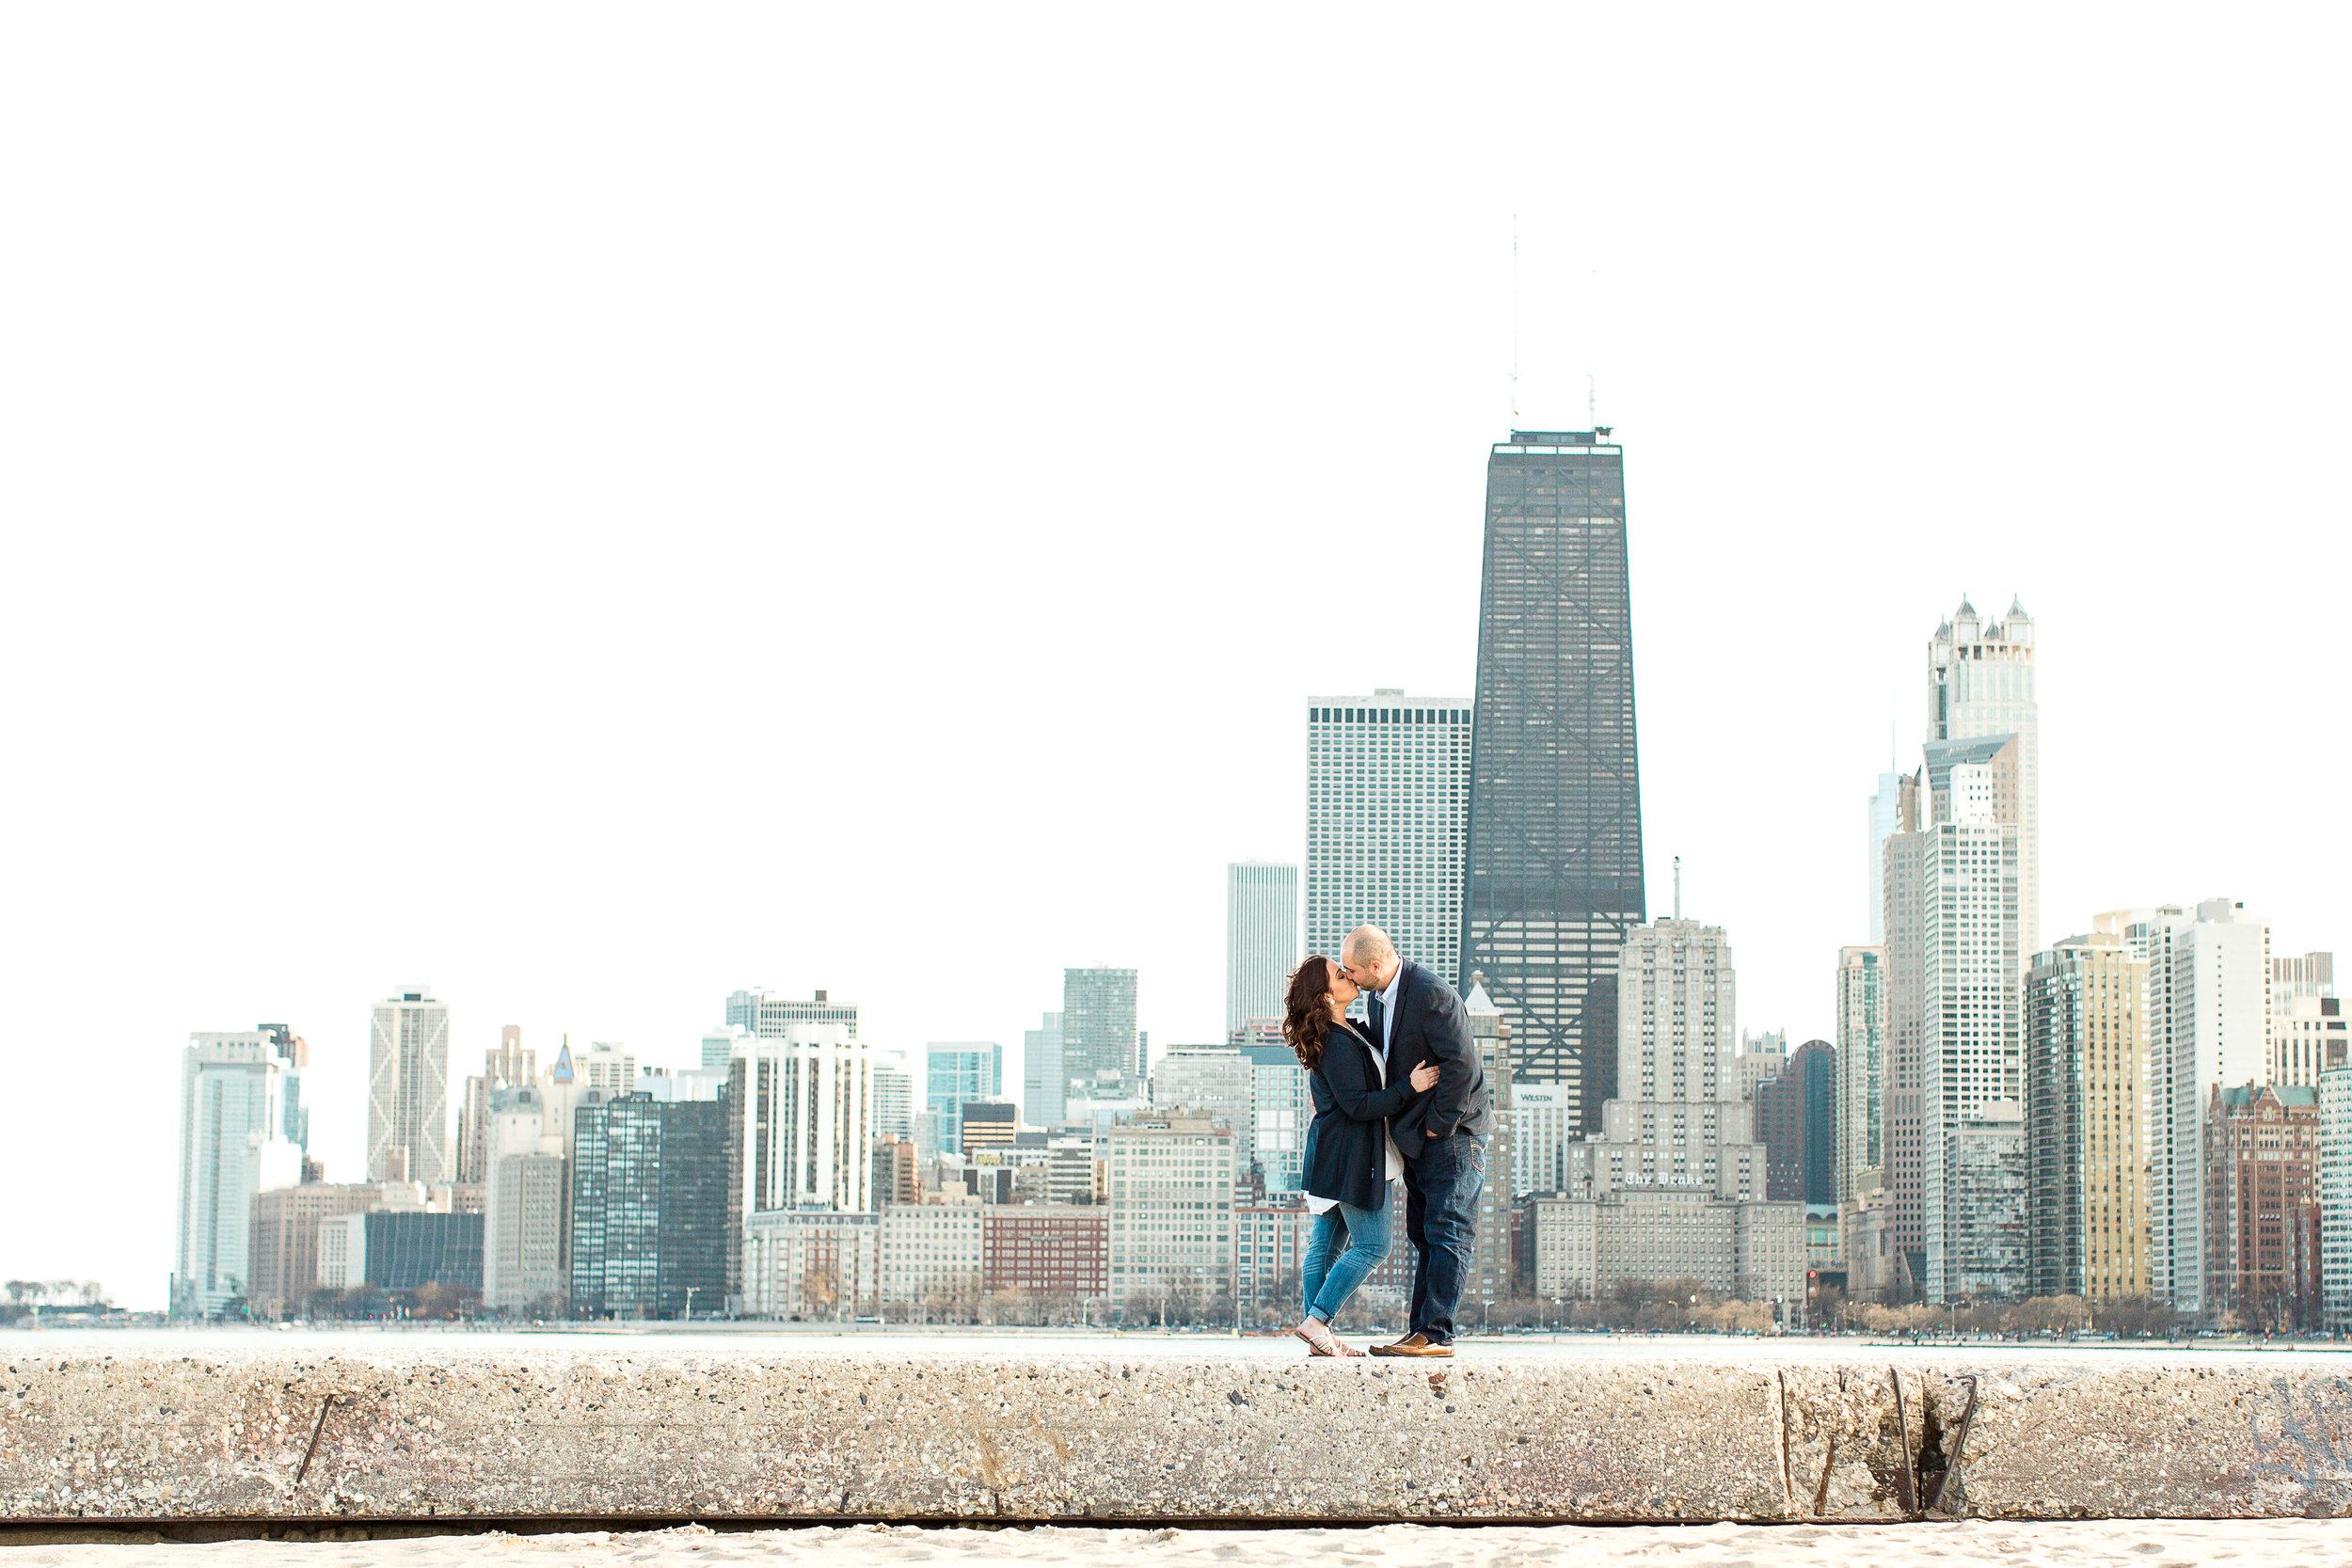 chicago-engagement-photographer-classy-olive-park-downtown-wedding-champagne-kristen-cloyd-6.jpg